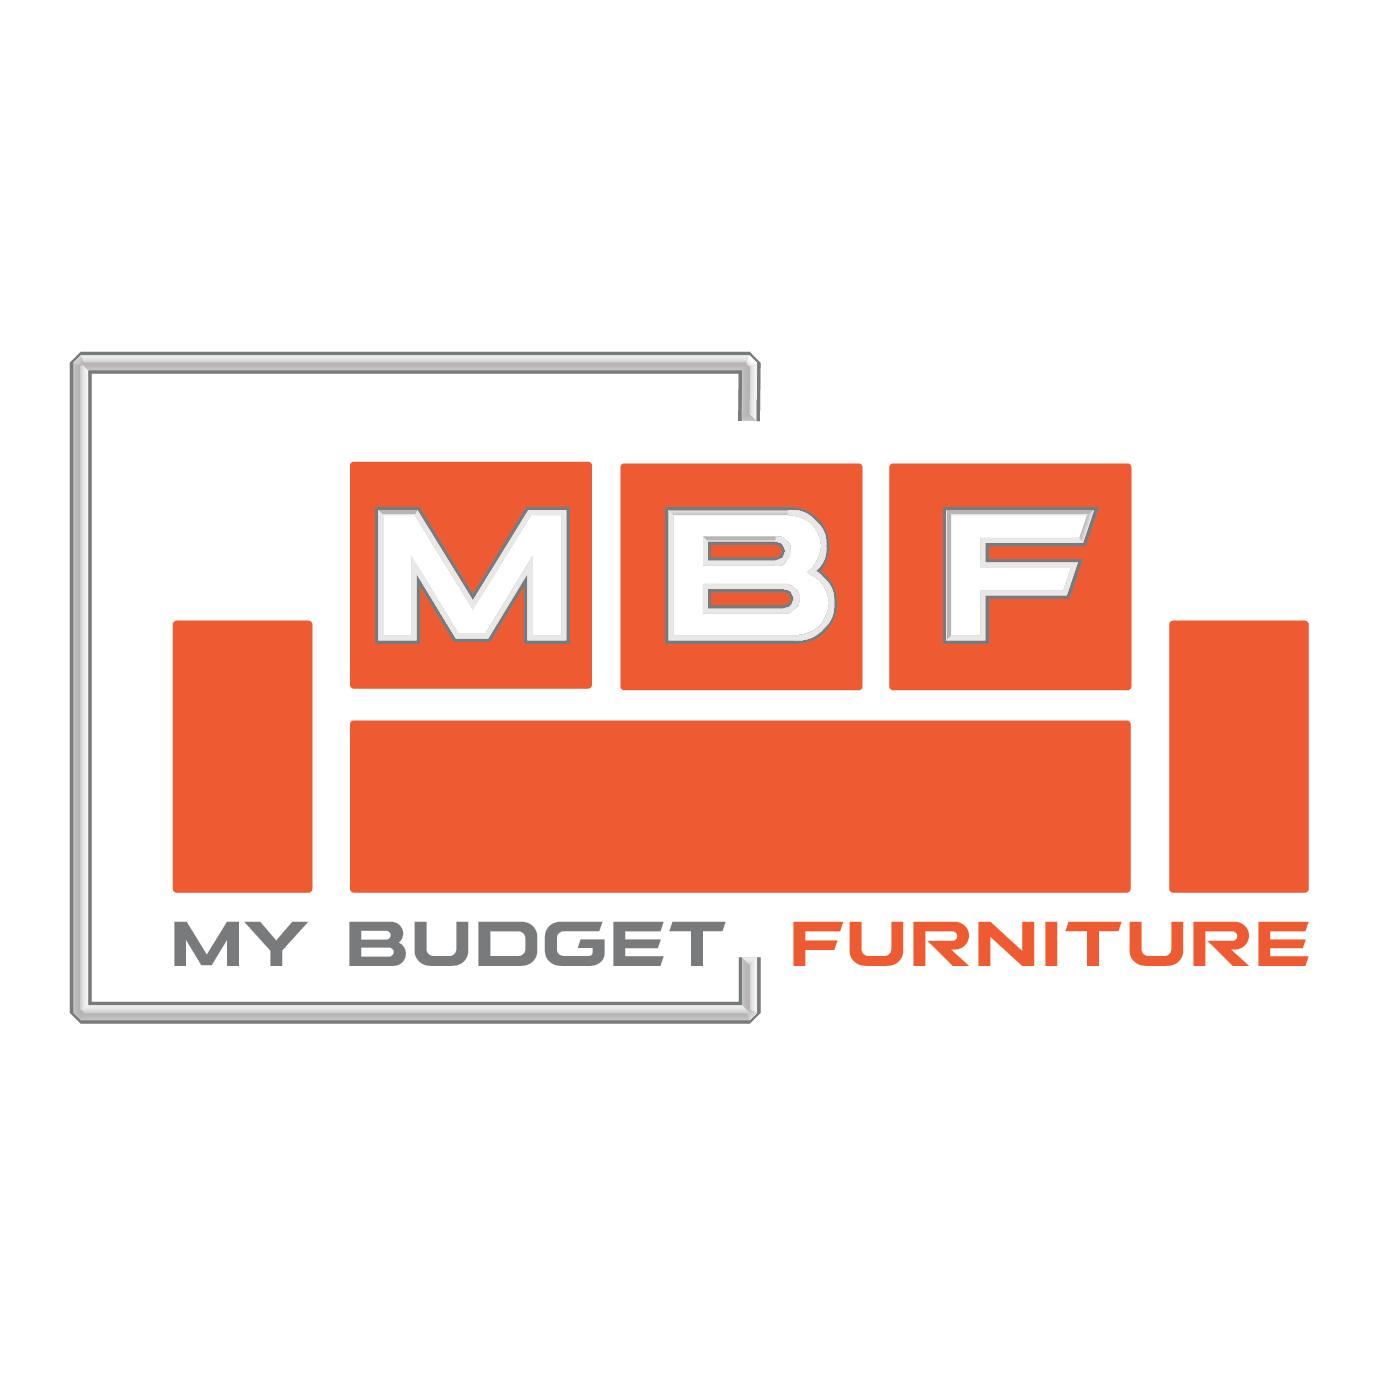 My Budget Furniture San Diego Ca Company Information